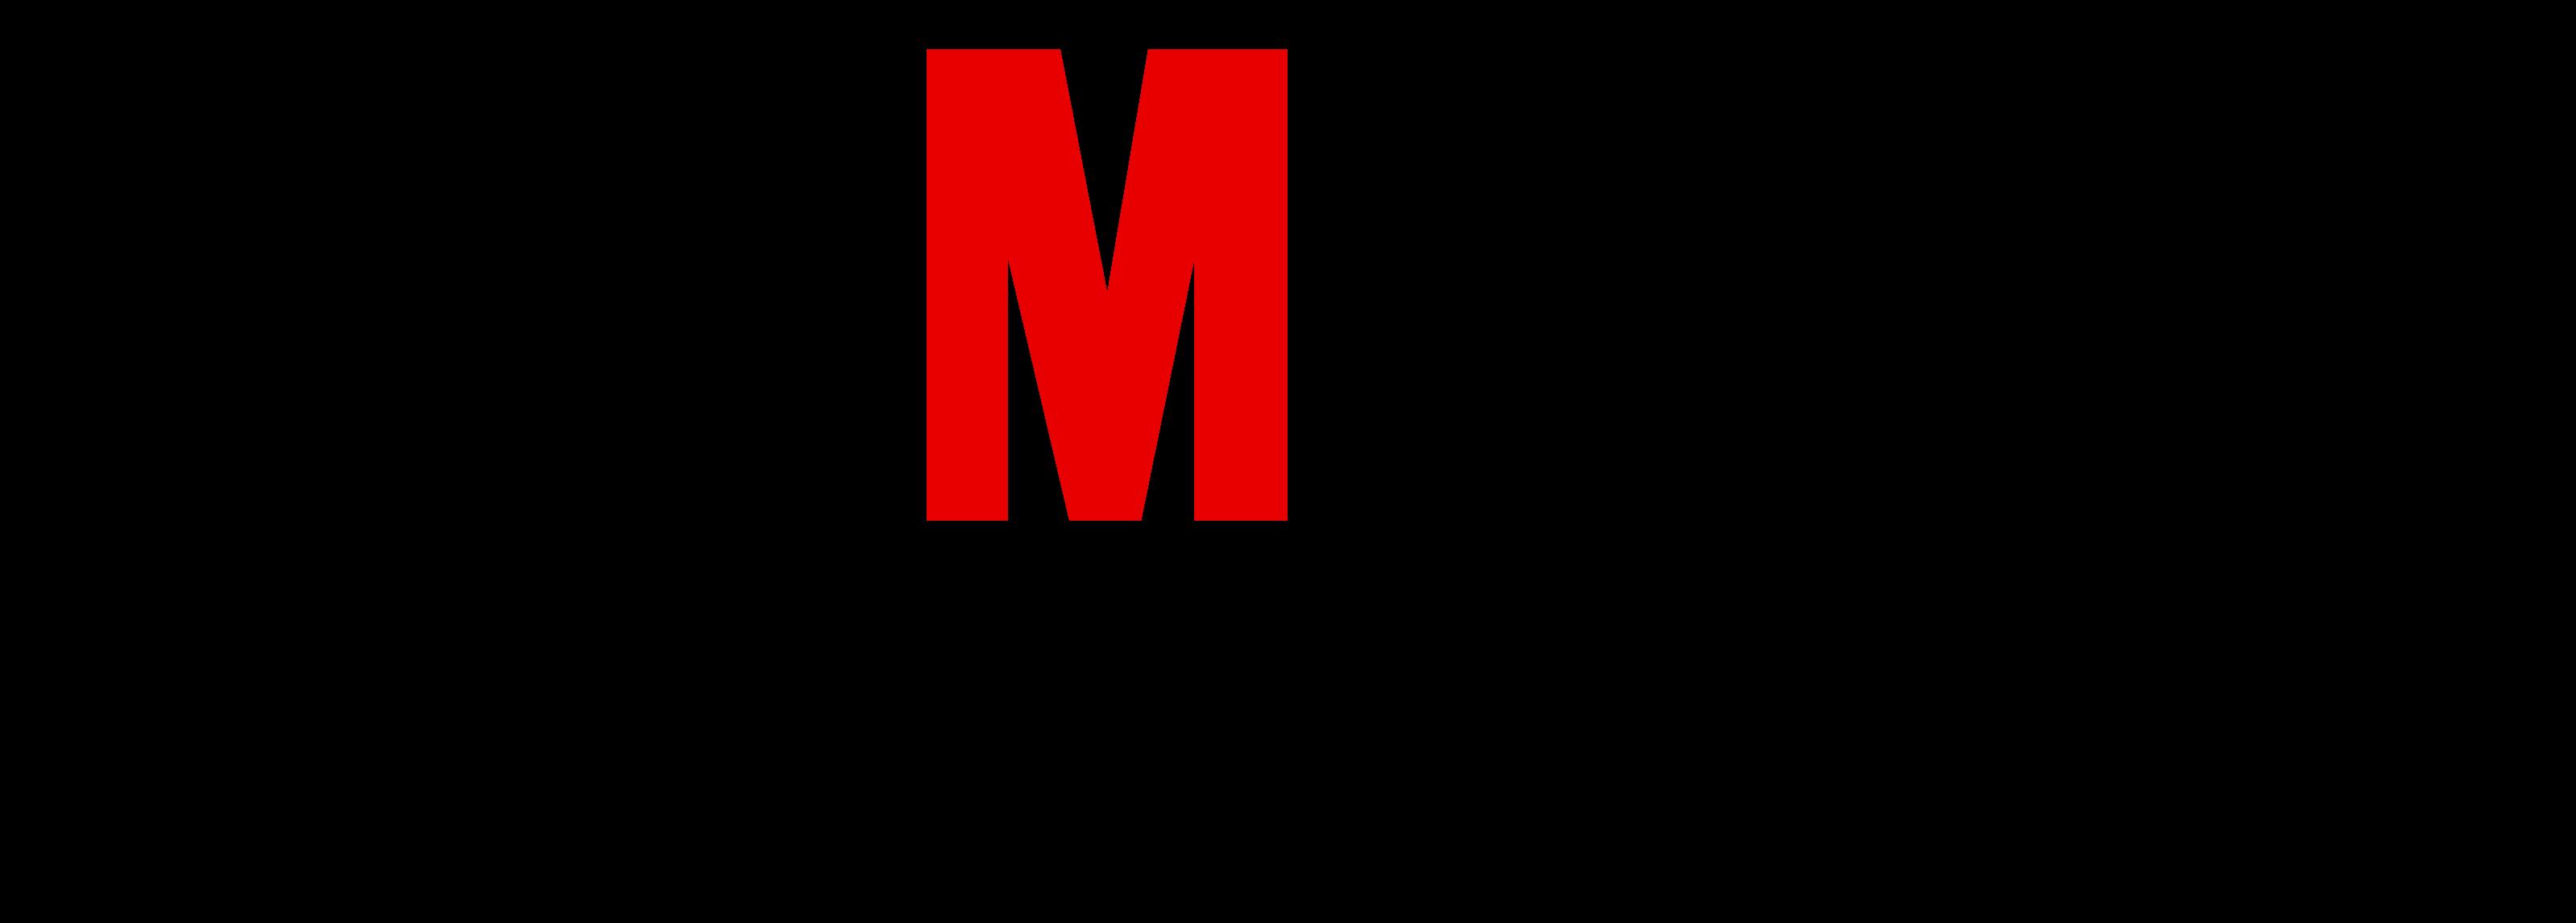 MRACE